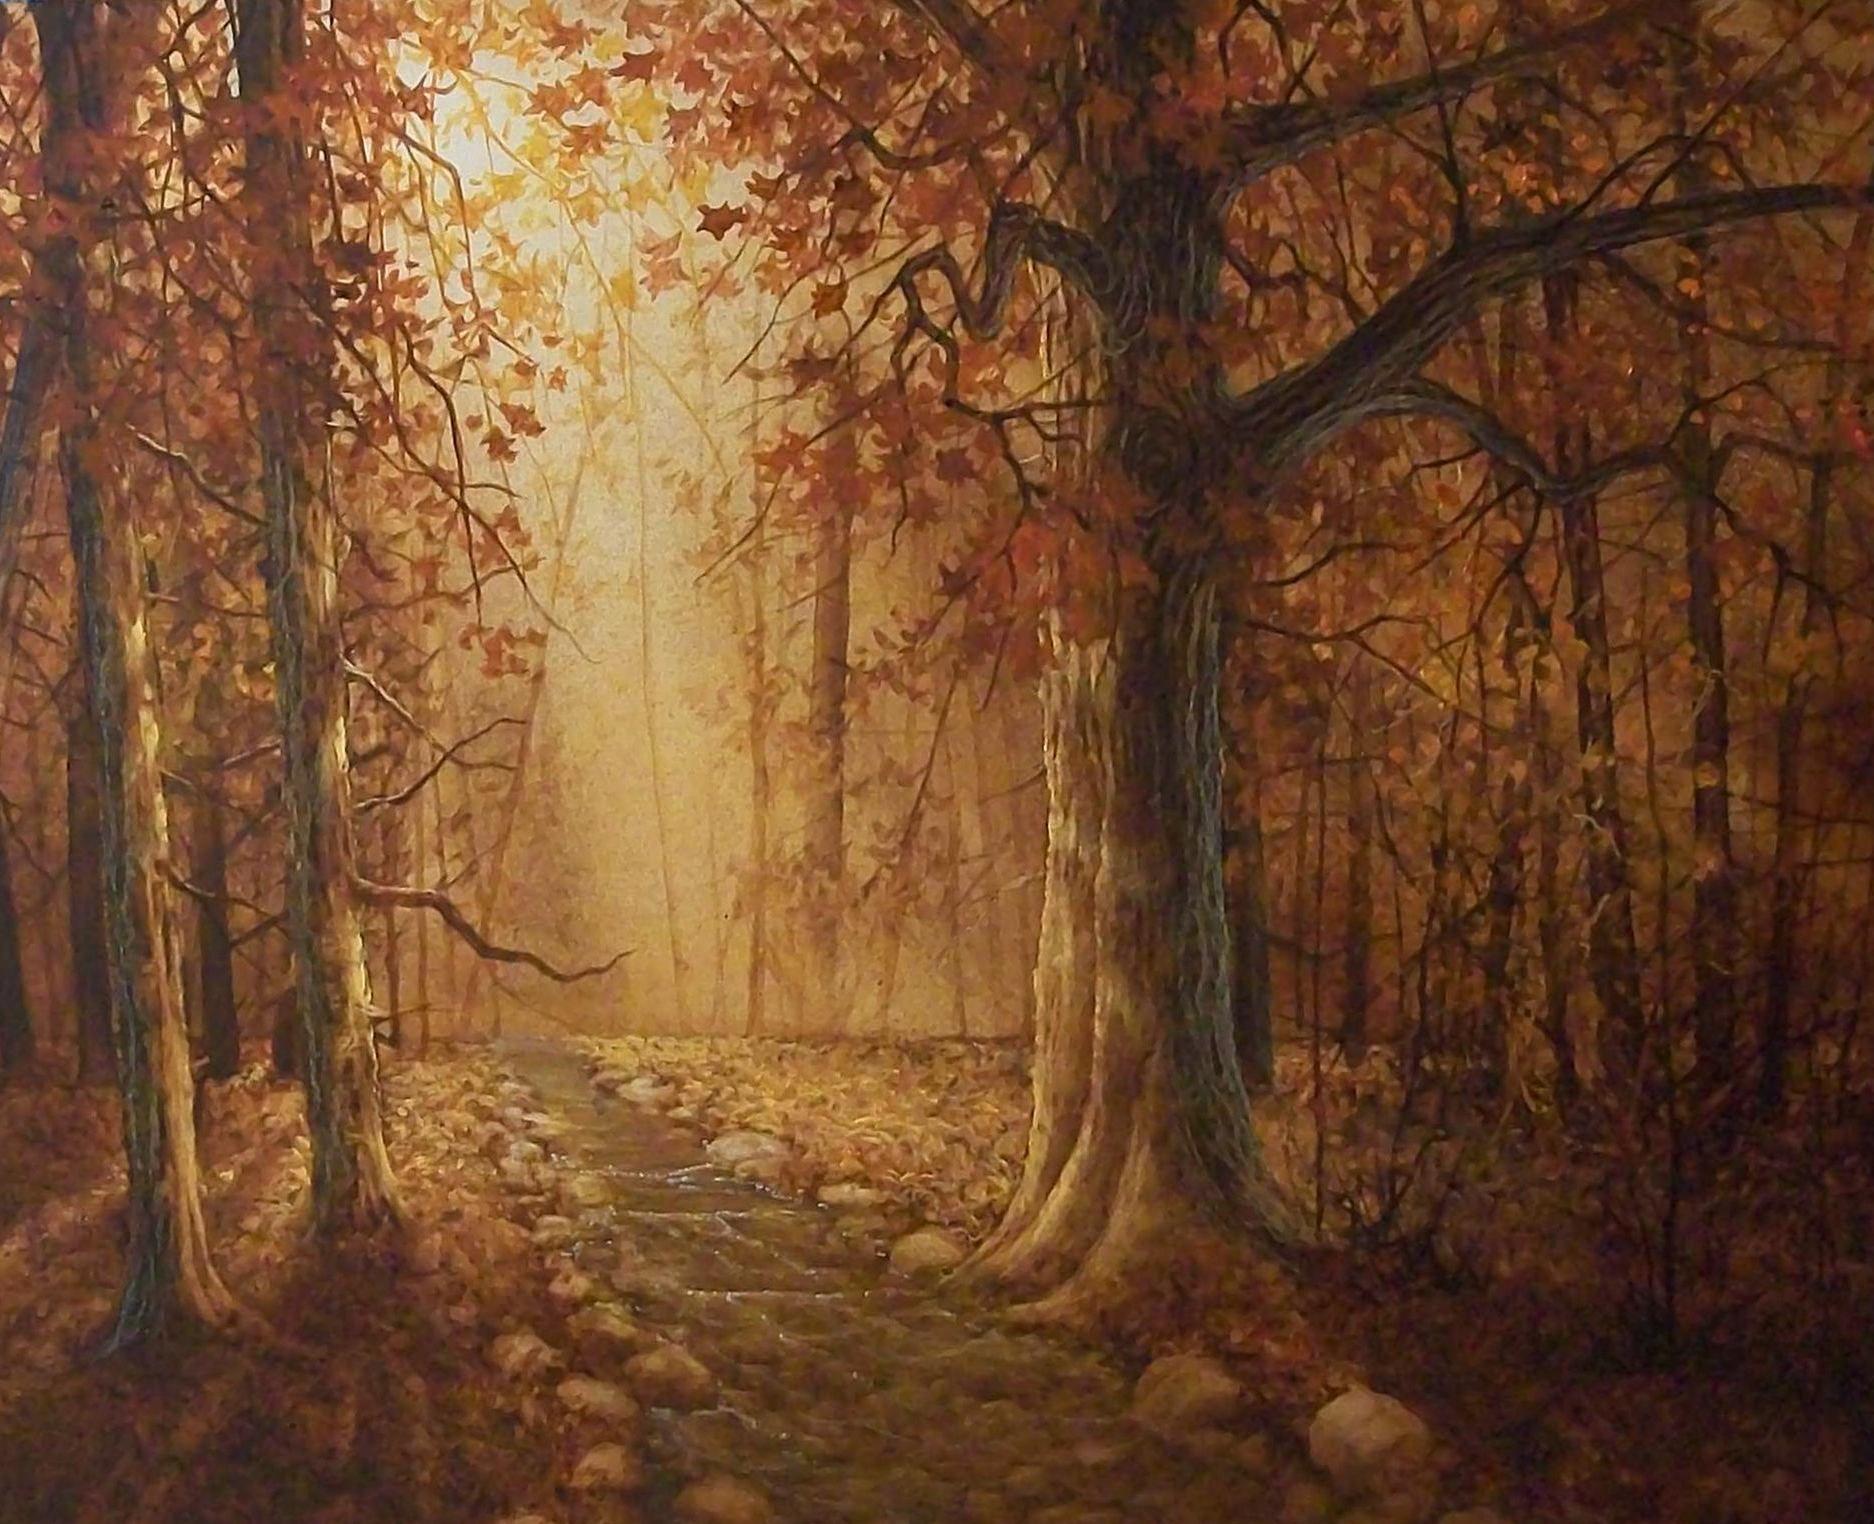 AUTUNNO NEL PARCO. Oil painting by Eddi Renesto.